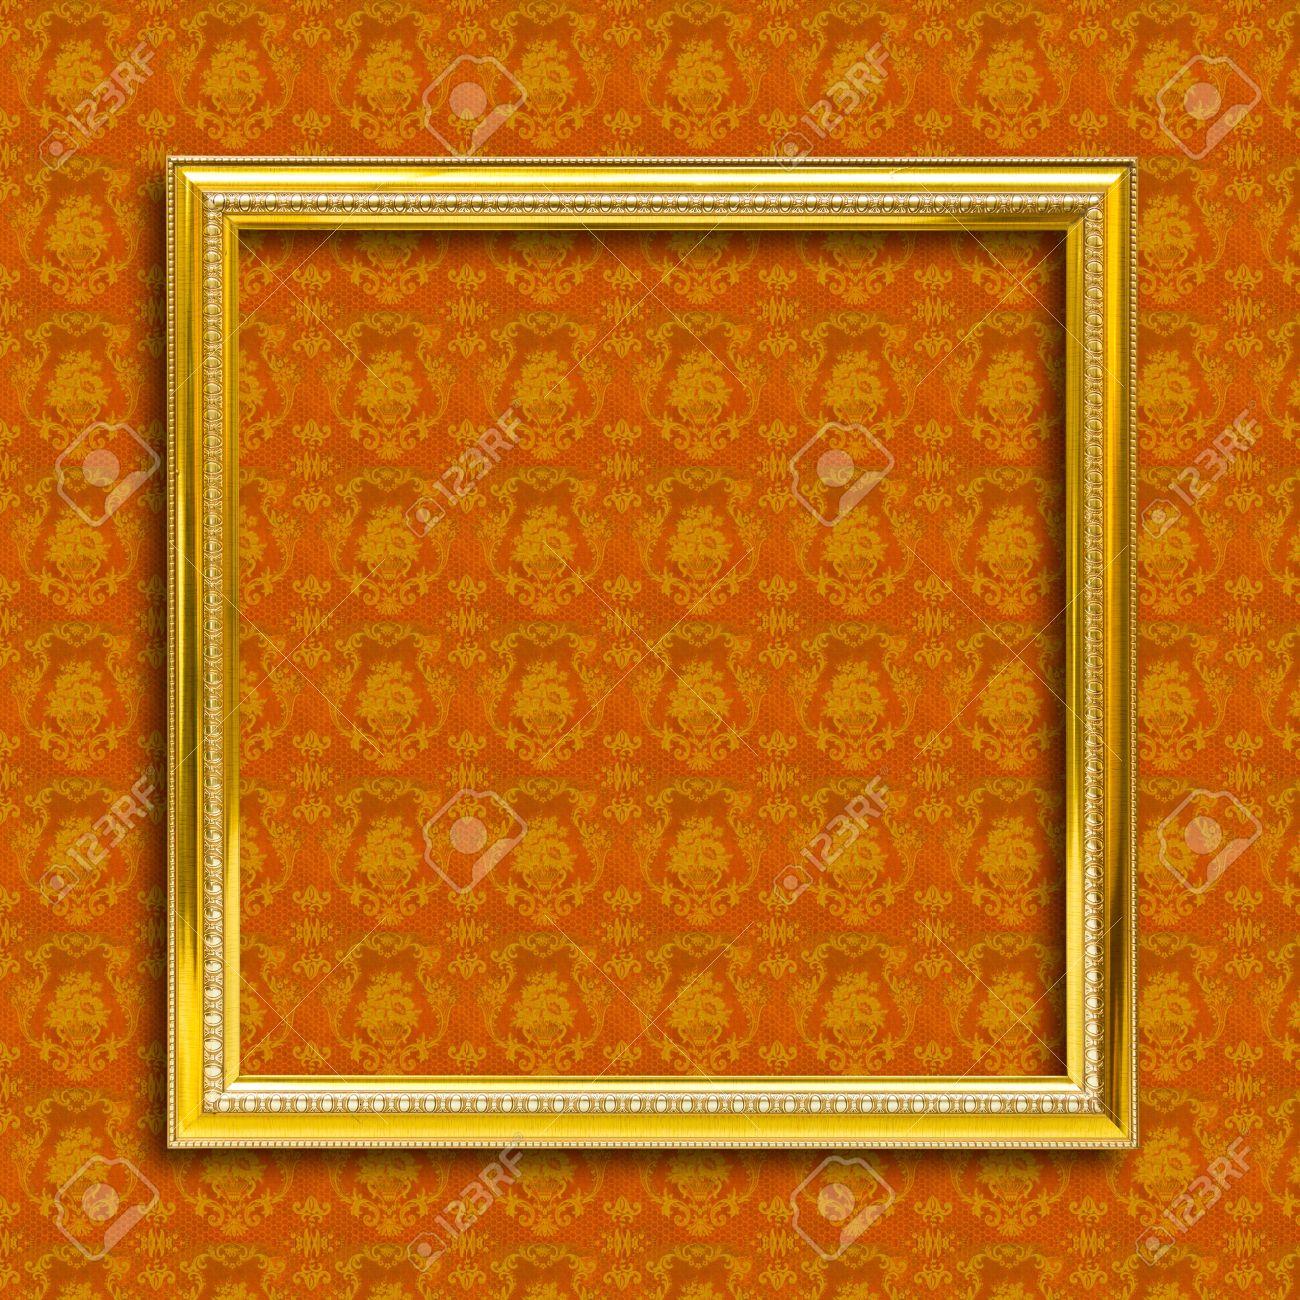 Modern Frames In Hd Image - Framed Art Ideas - roadofriches.com